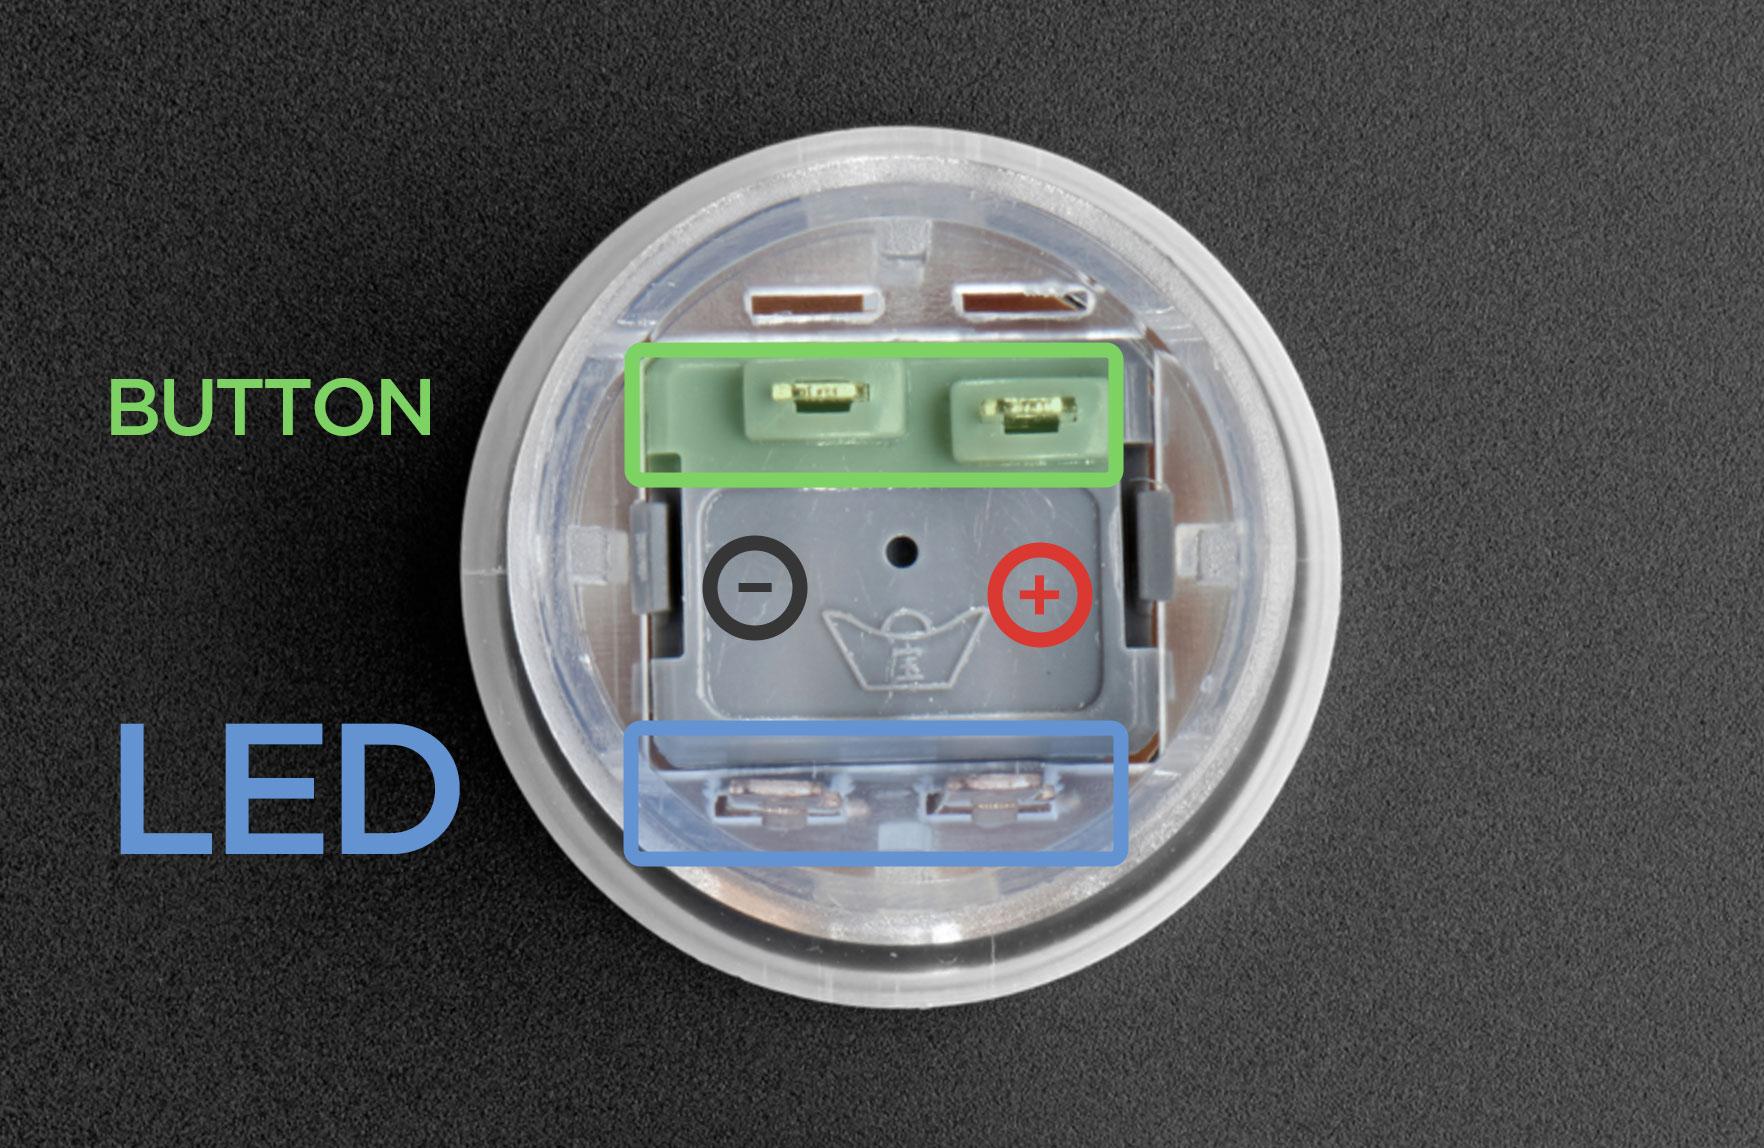 3d_printing_arcade-button-pinout.jpg